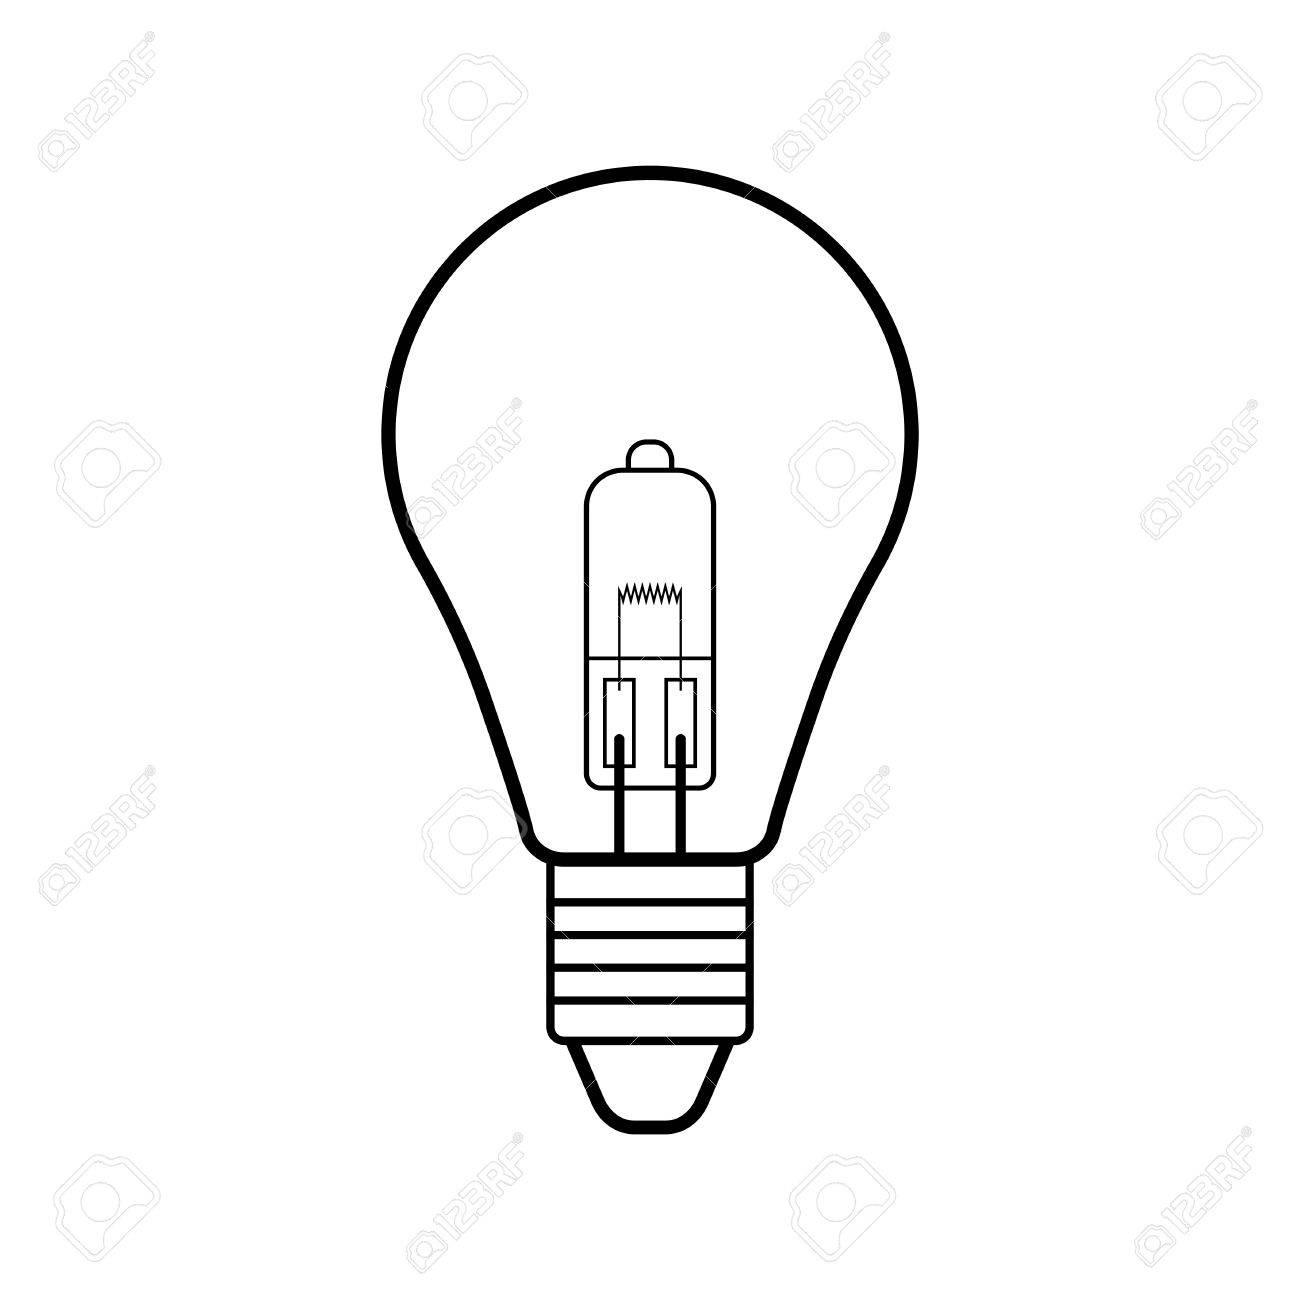 1300x1300 Halogen Light Bulb. Flat Linear Icon. Lighting Equipment. Energy